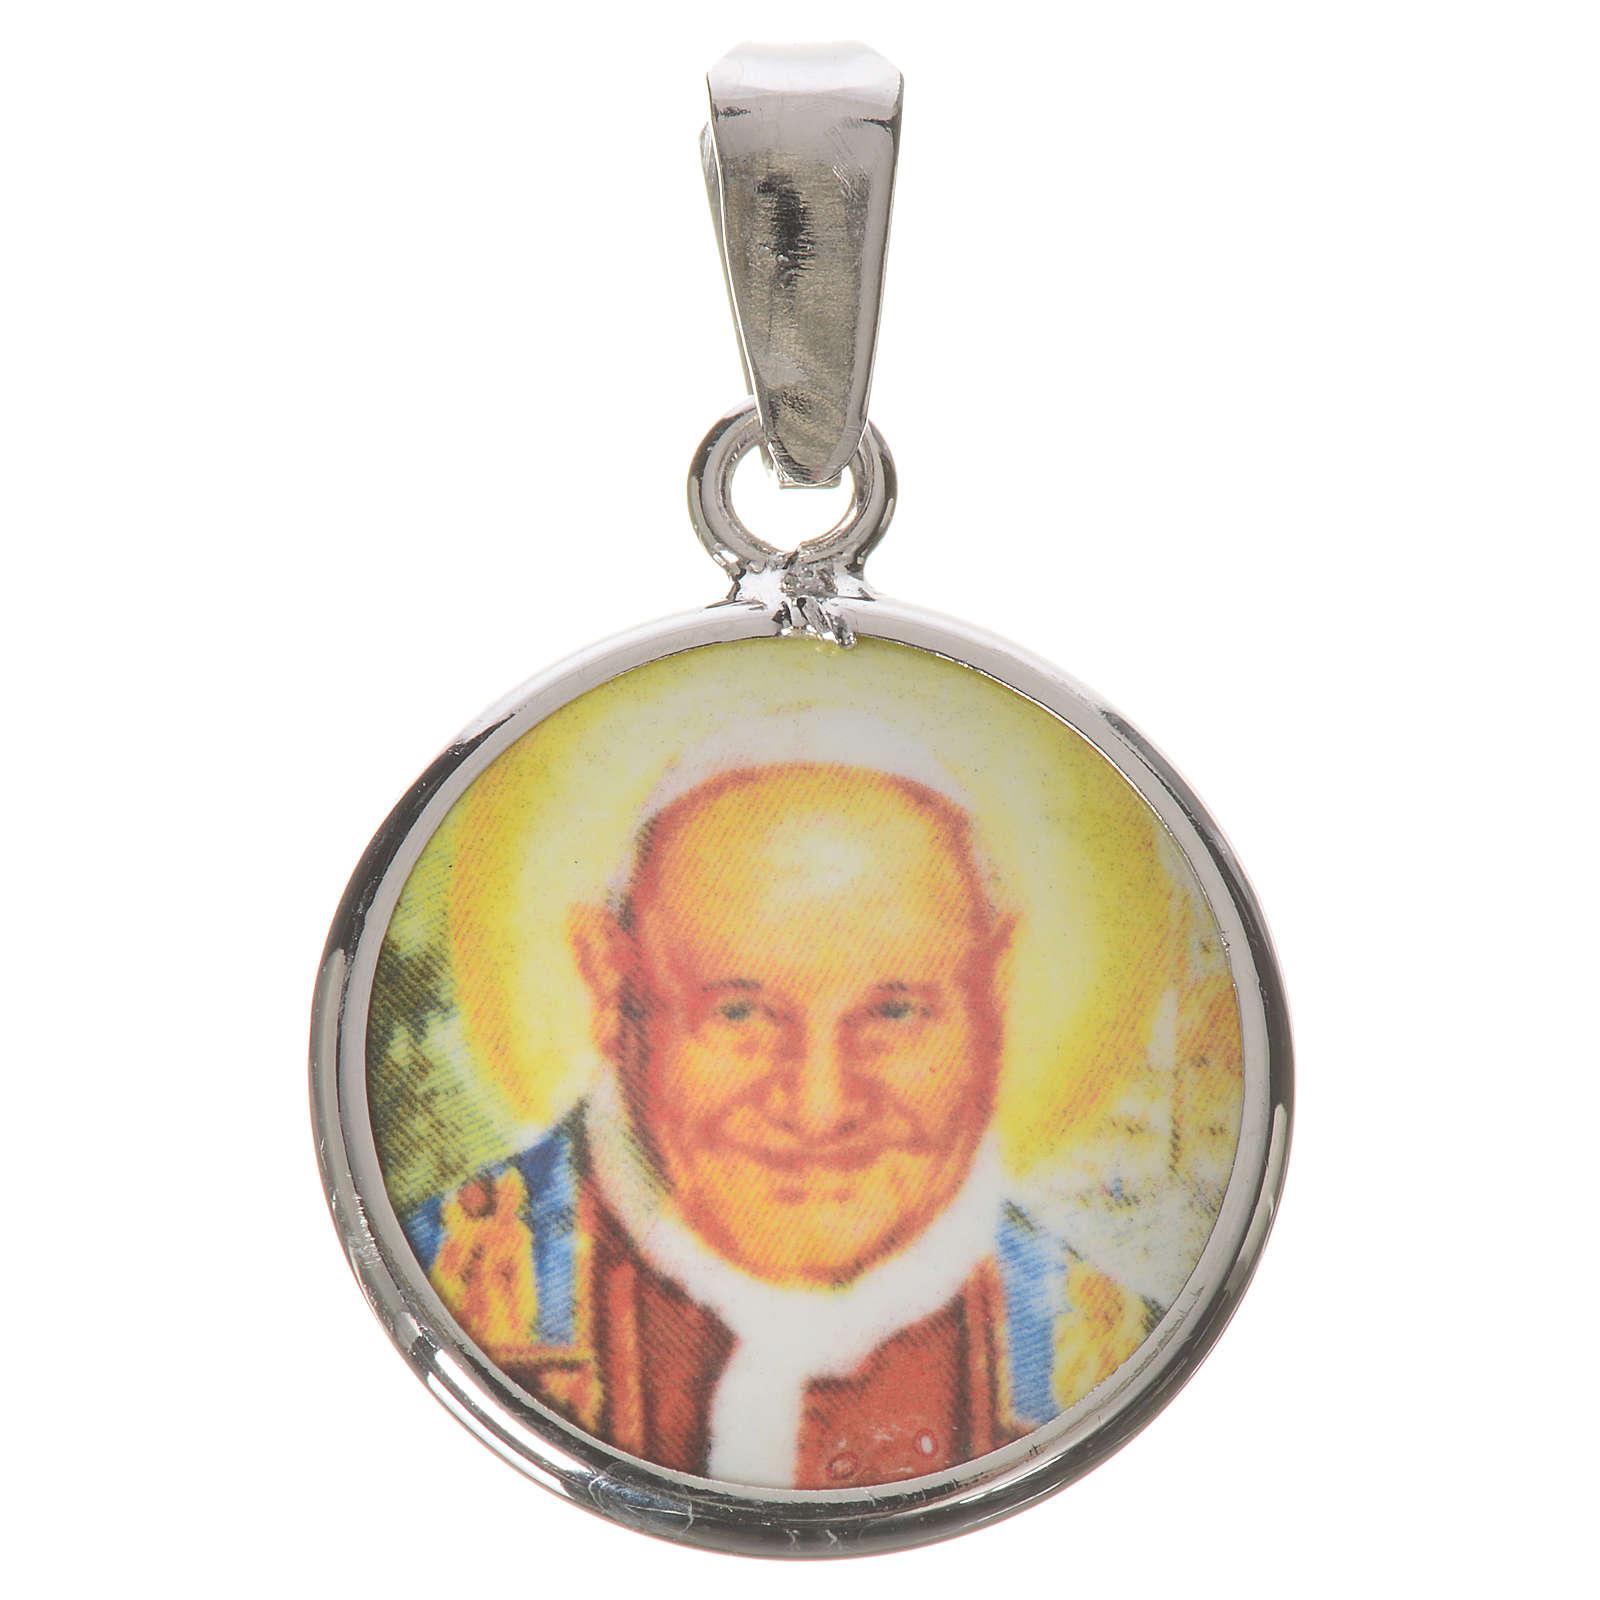 Medaglia tonda arg. 18 mm Giovanni XXIII 4